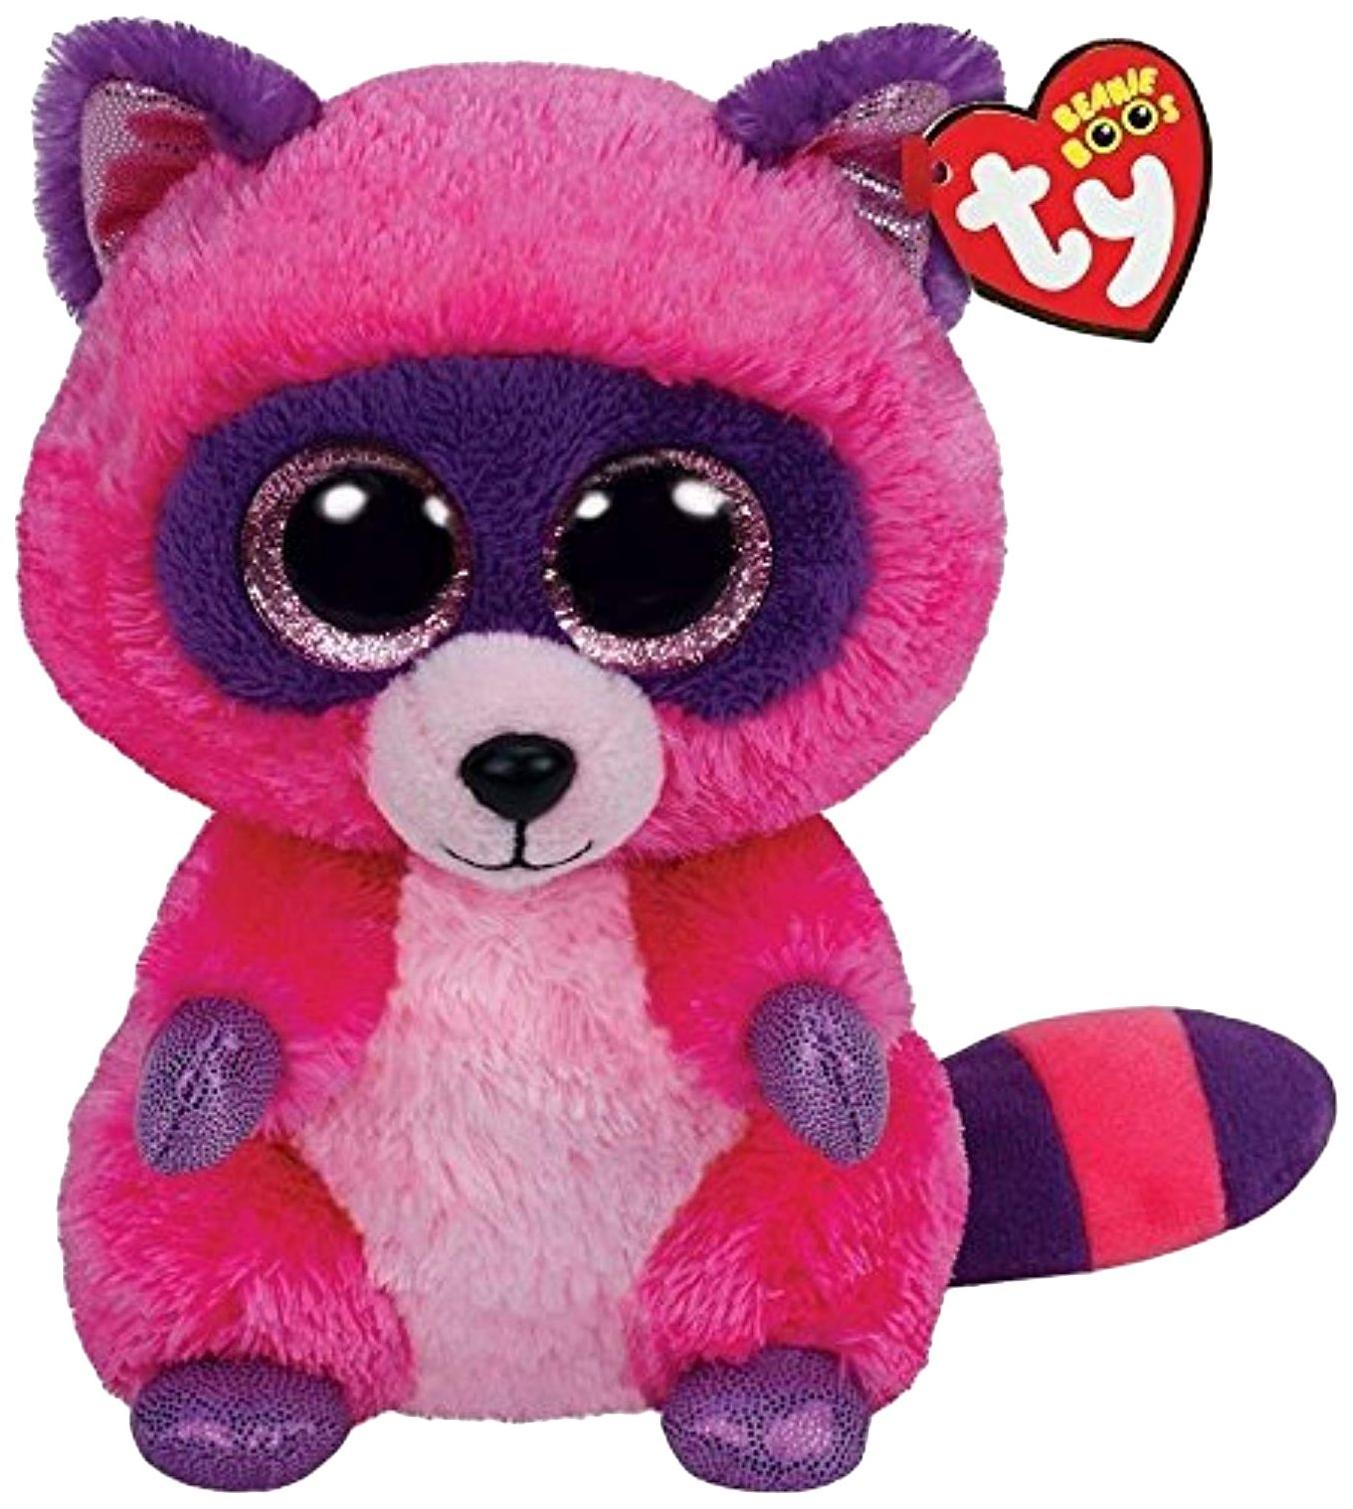 Купить Брелок Beanie Boo's Енот Рокси , розово-фиолетовый, 7.6 см Ty Inc, Аксессуары для ранцев и рюкзаков